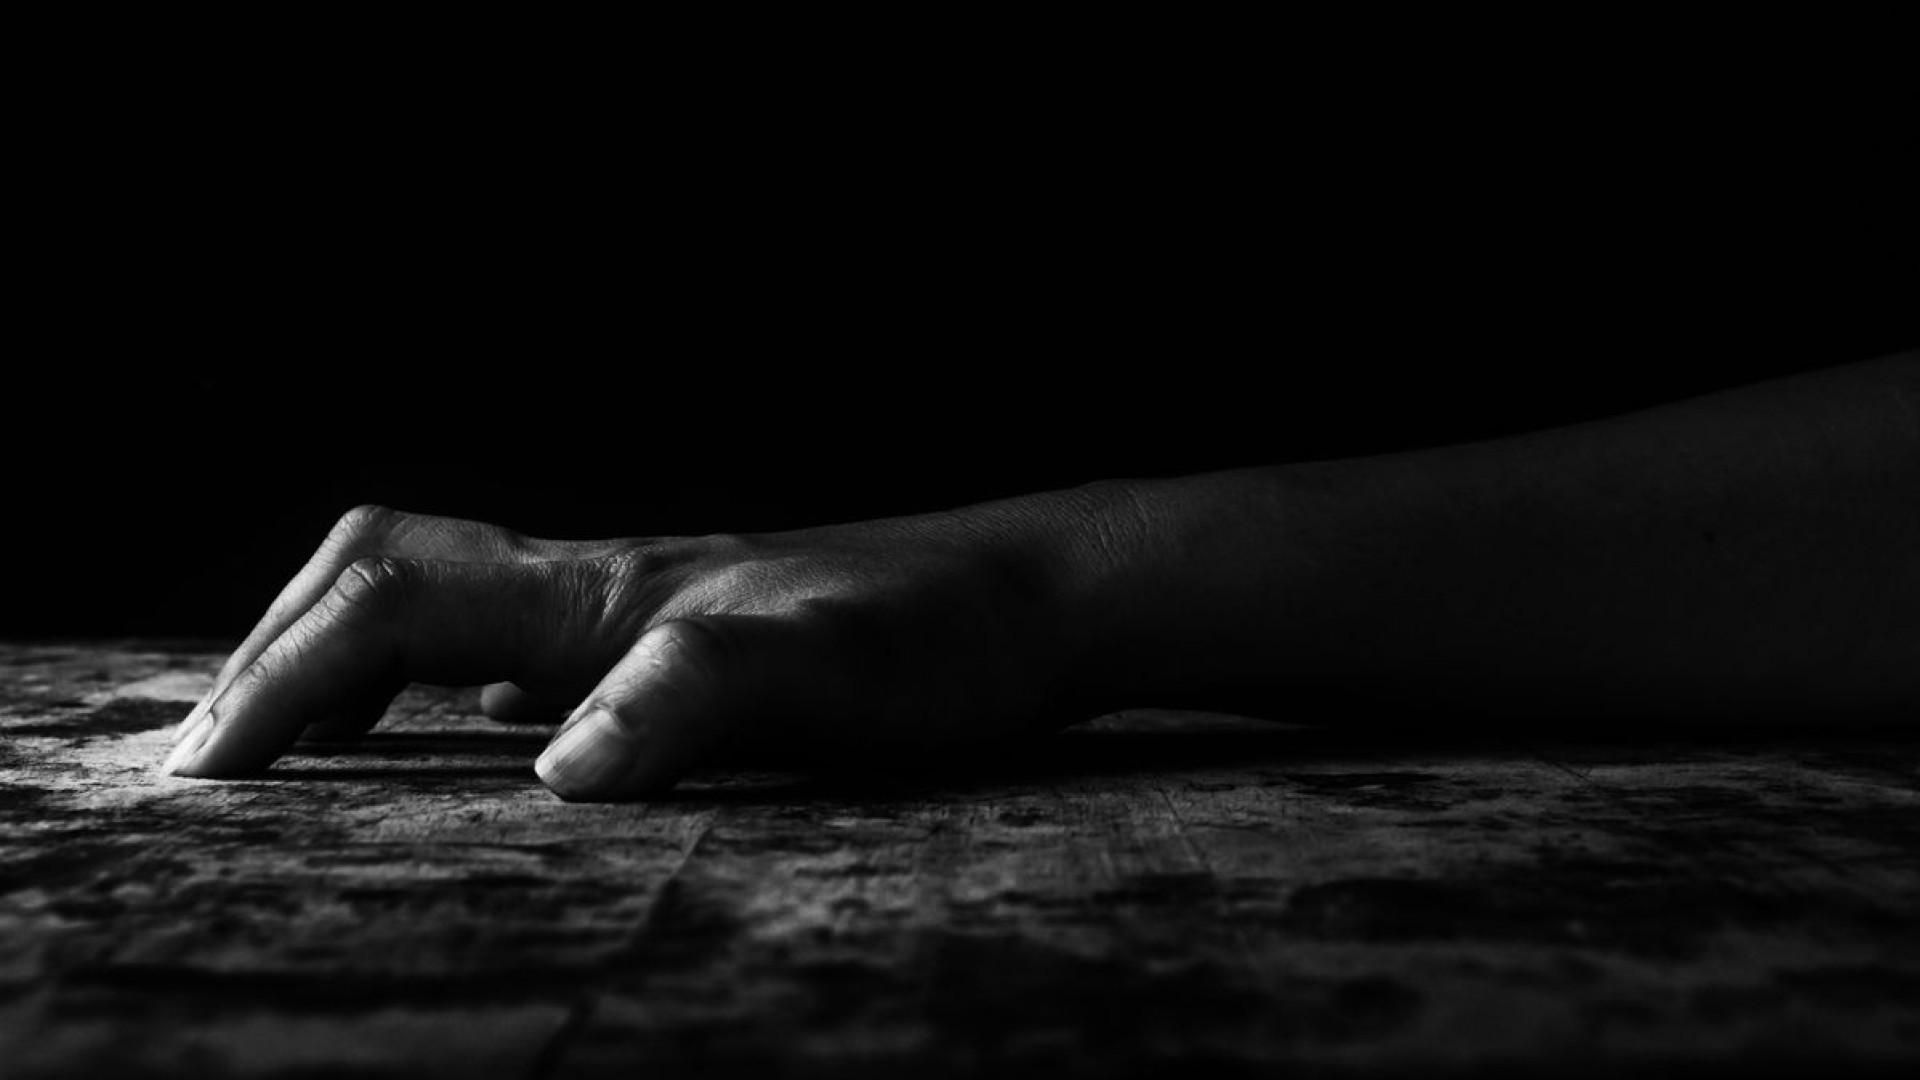 Casal condenado após manter mulher como escrava durante 16 anos